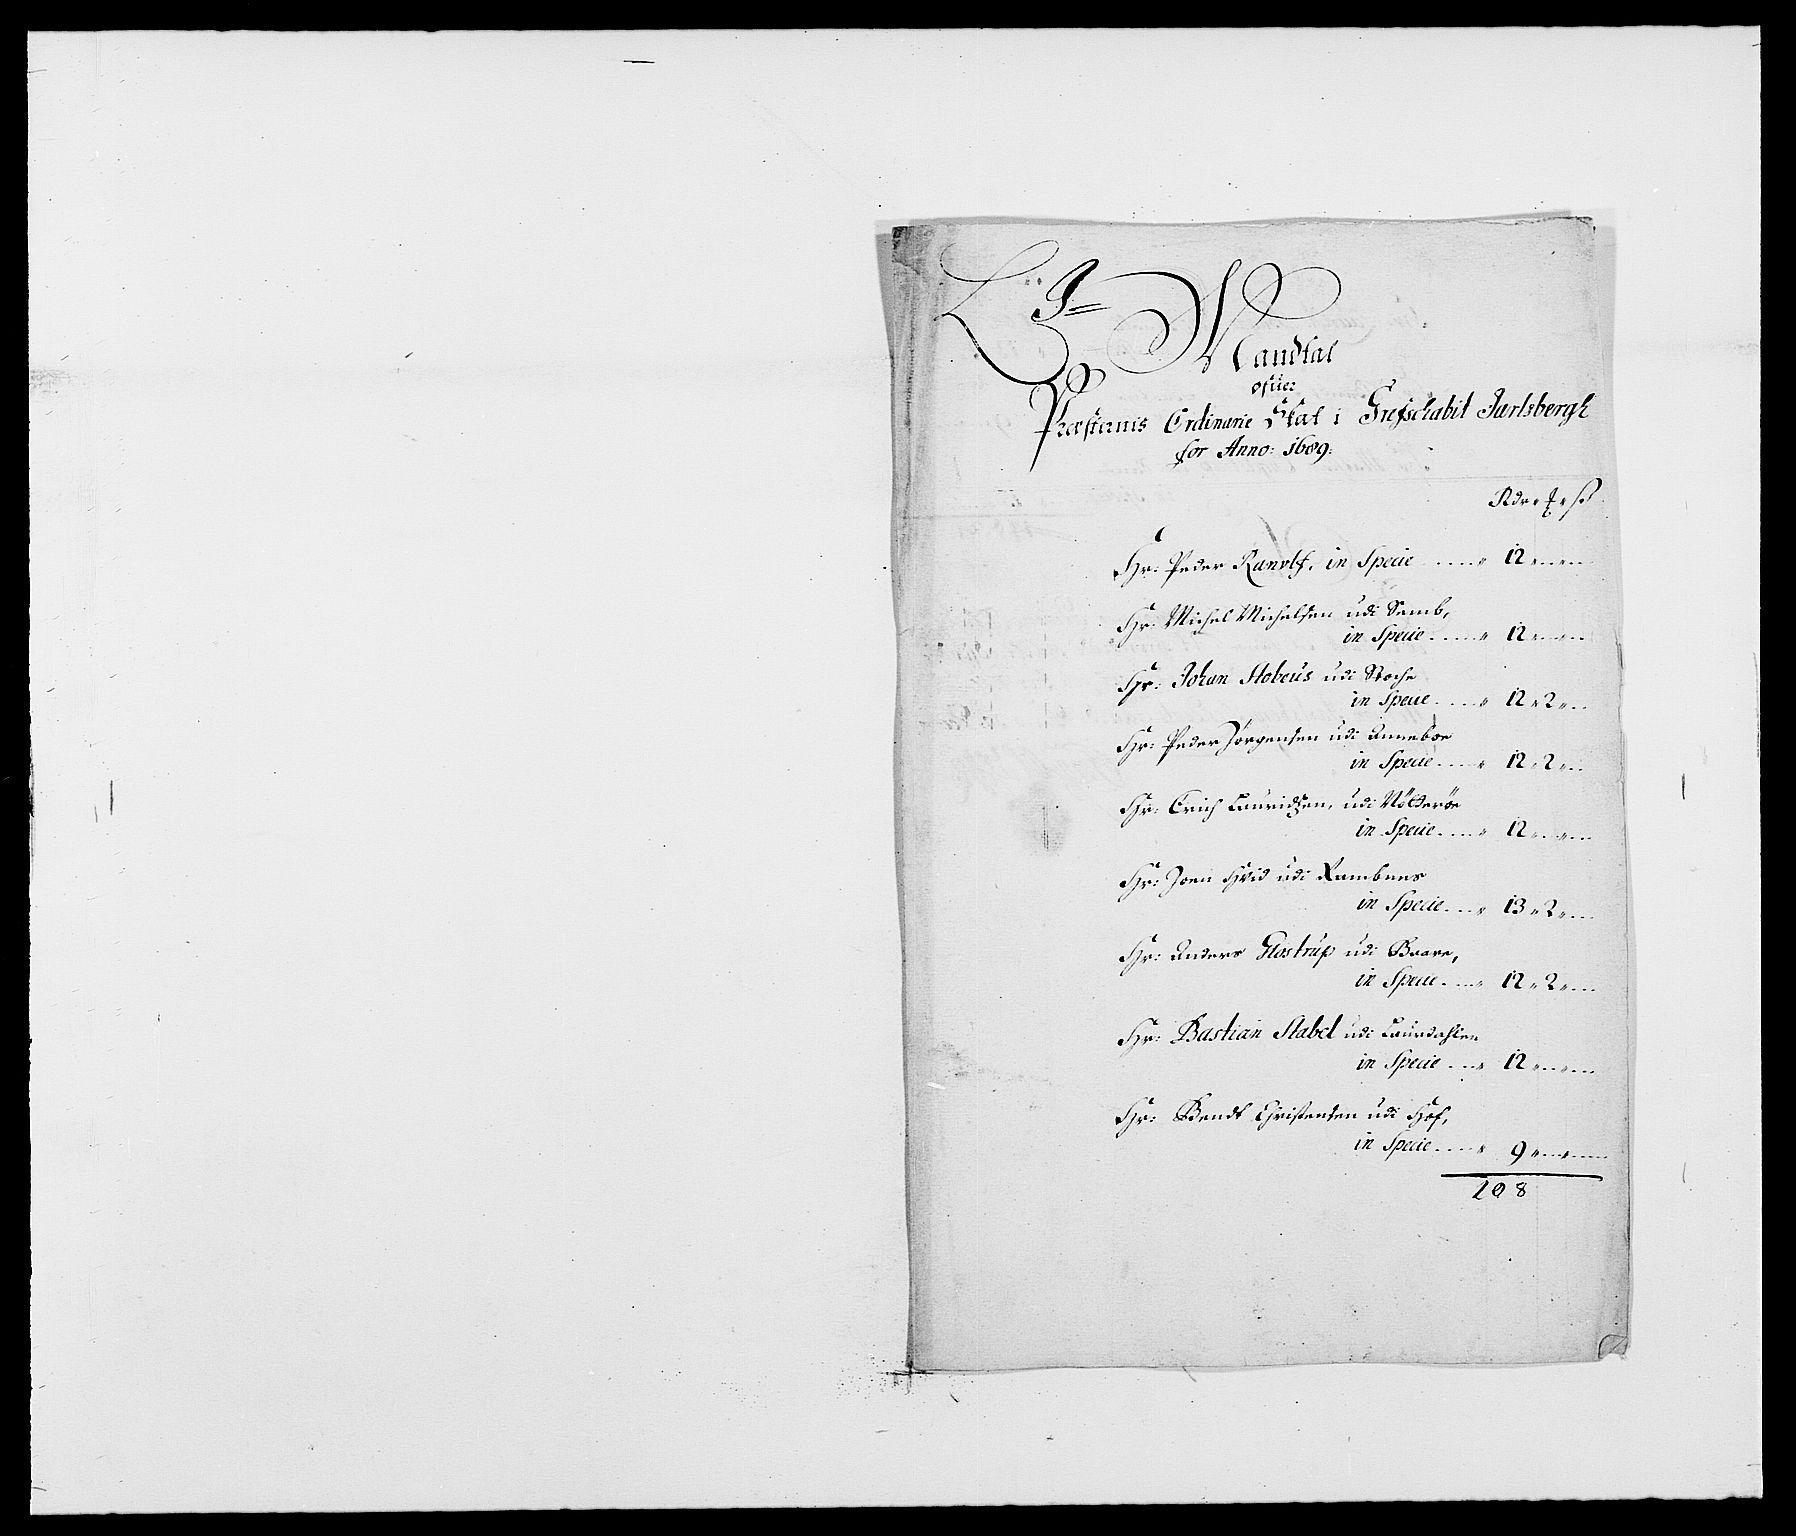 RA, Rentekammeret inntil 1814, Reviderte regnskaper, Fogderegnskap, R32/L1860: Fogderegnskap Jarlsberg grevskap, 1686-1690, s. 368